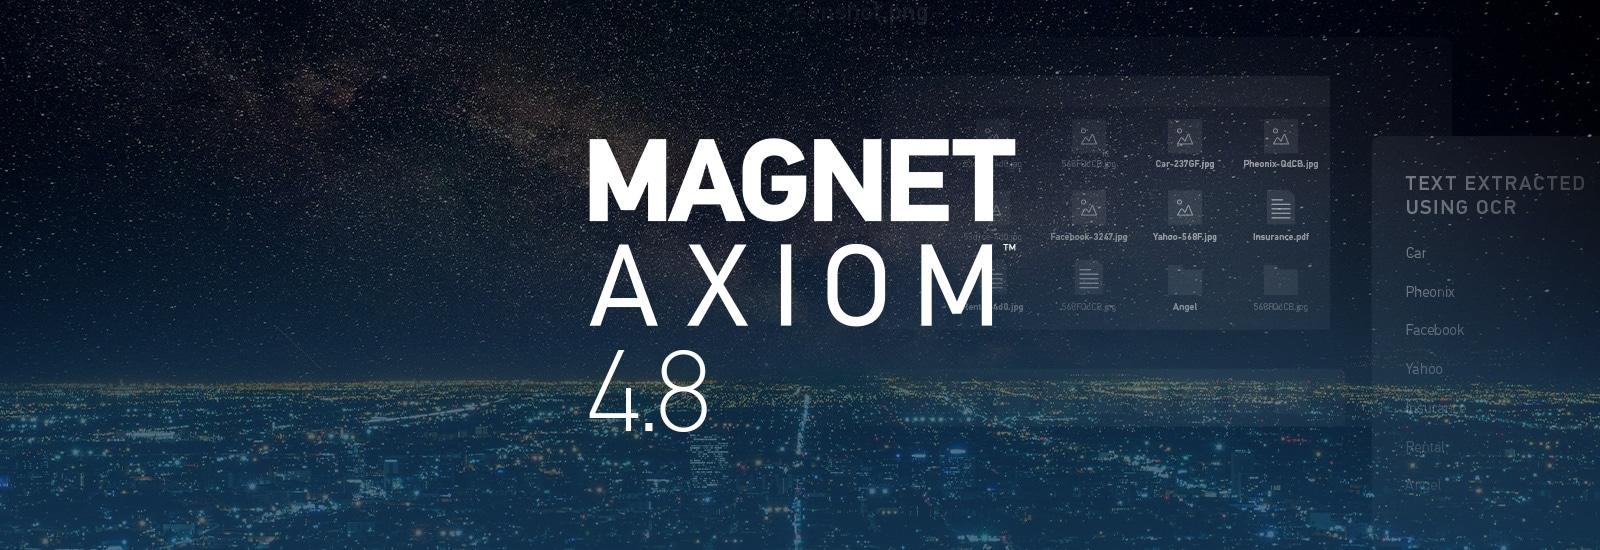 Magnet AXIOM 4.8